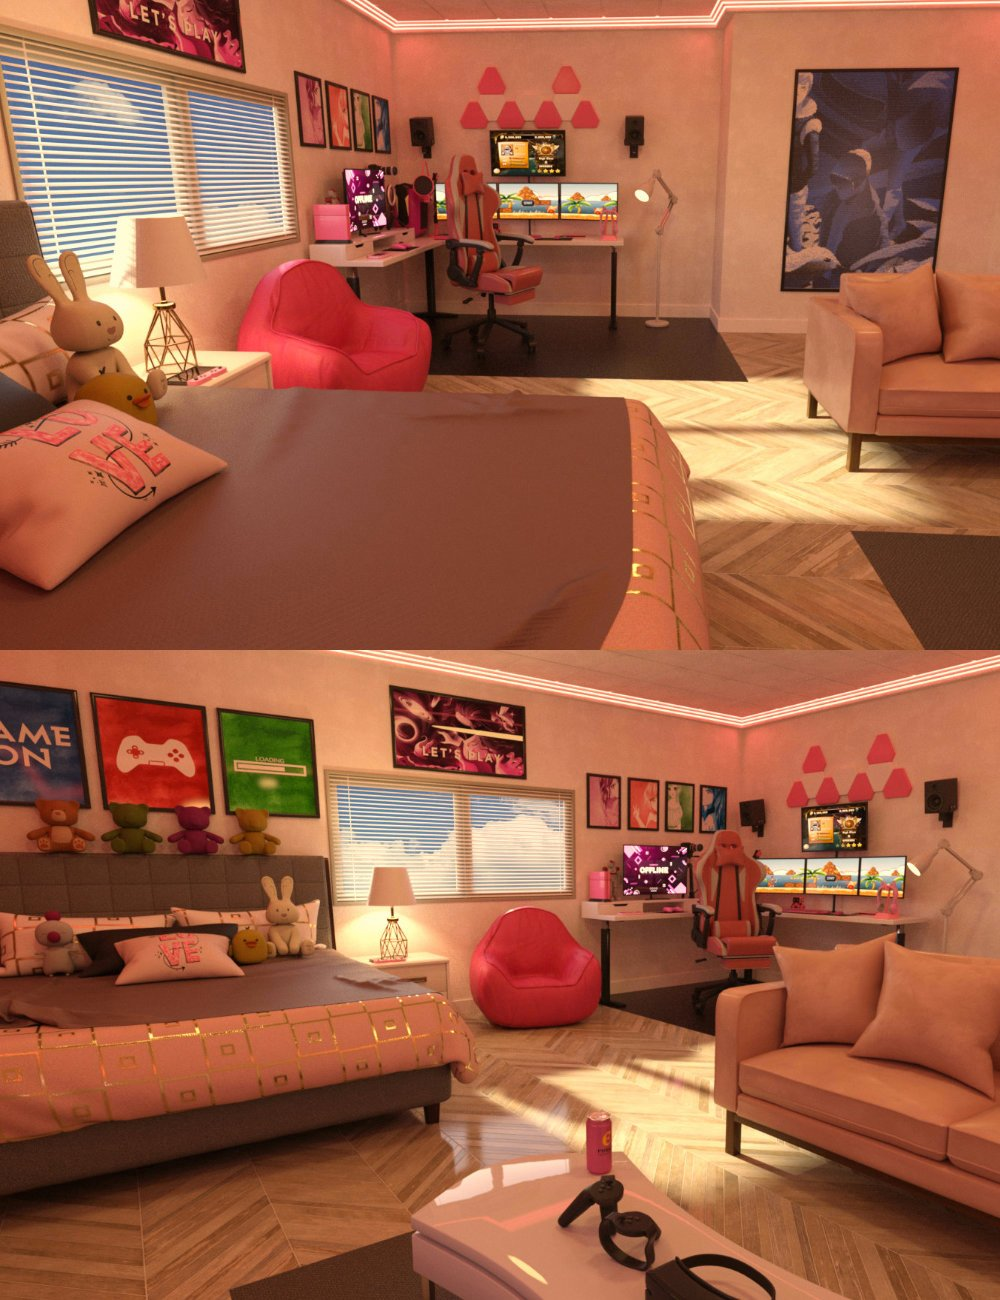 FG VR Gaming Room by: IronmanFugazi1968, 3D Models by Daz 3D